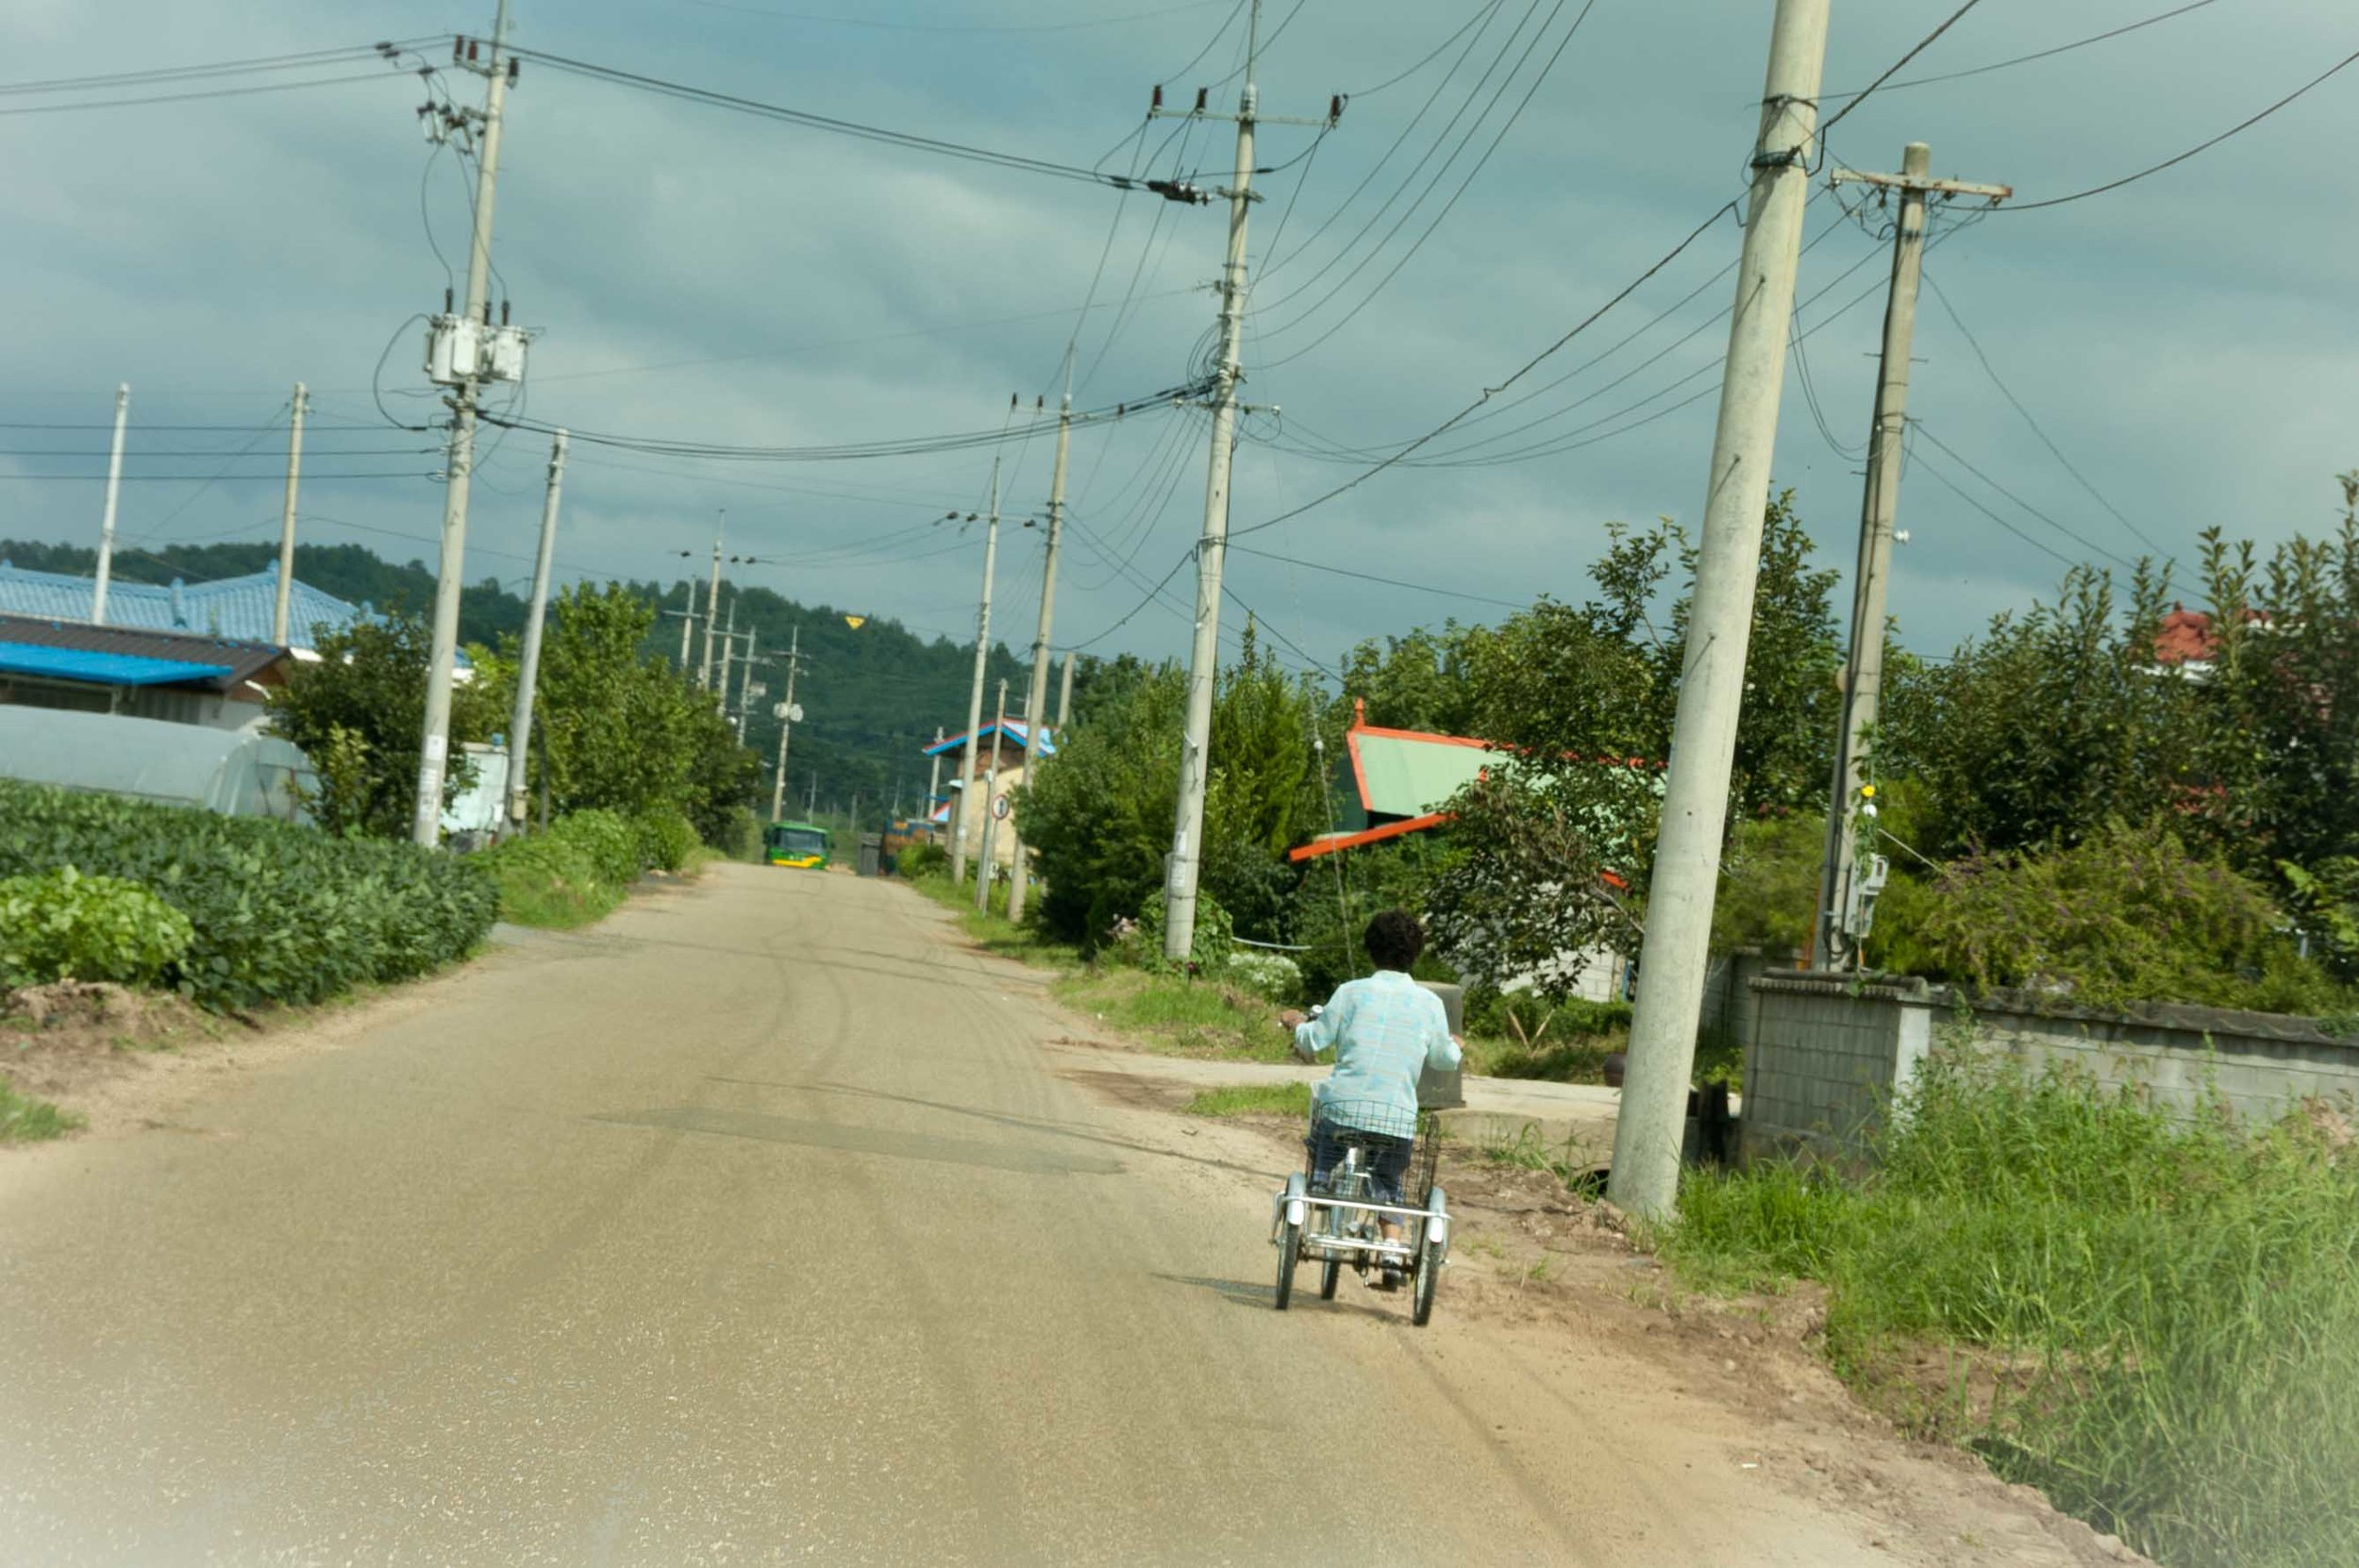 andong lady on bike.jpg